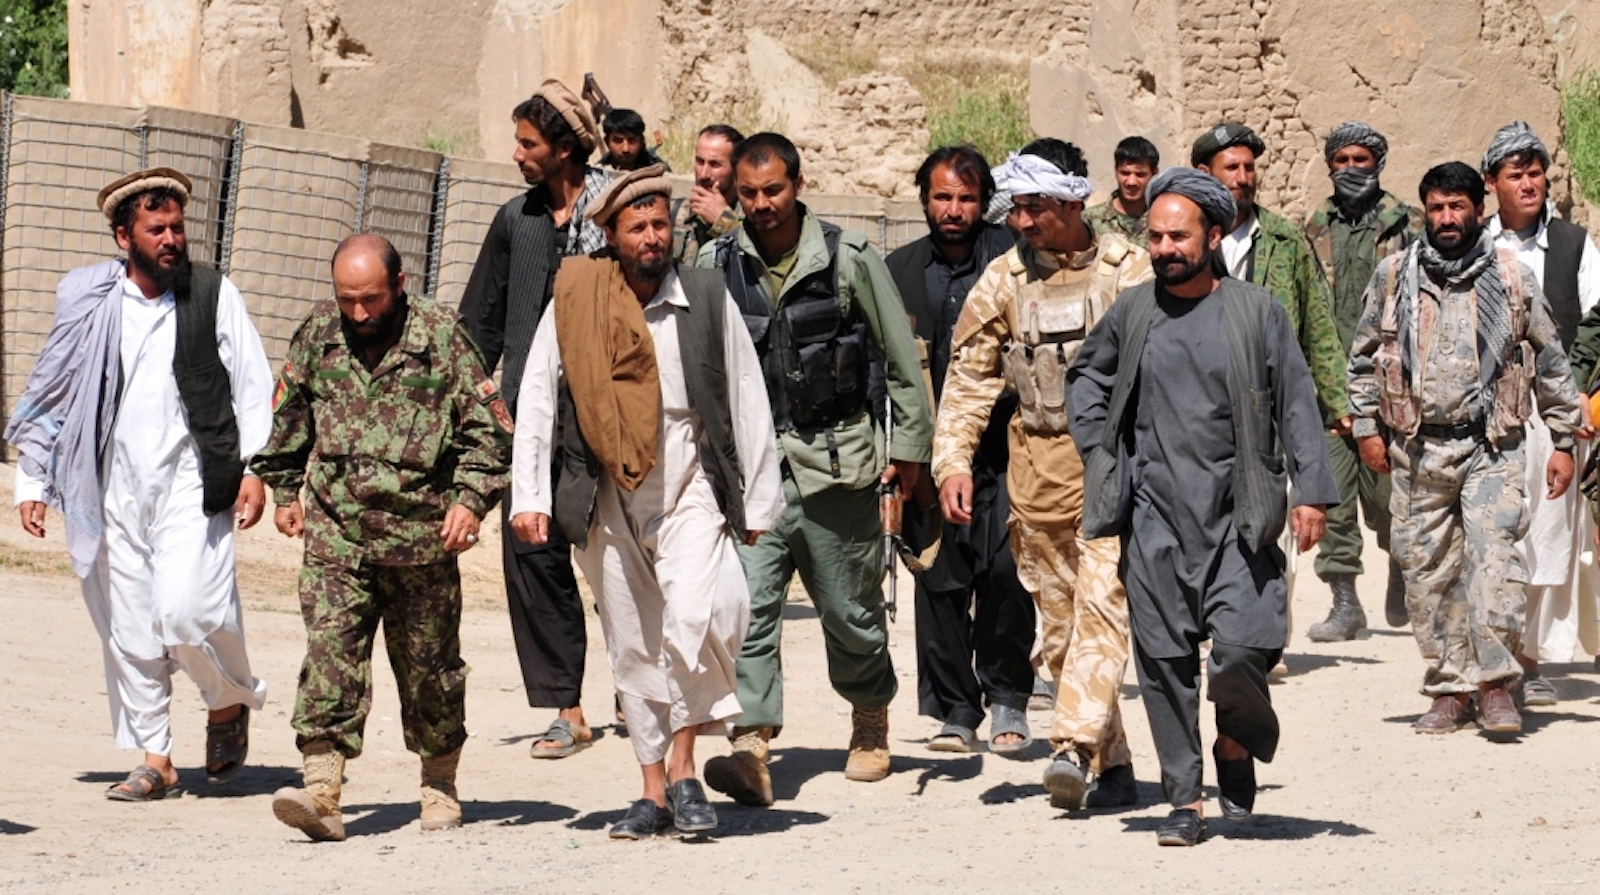 Taliban insurgents (Photo: Wikimedia Commons)